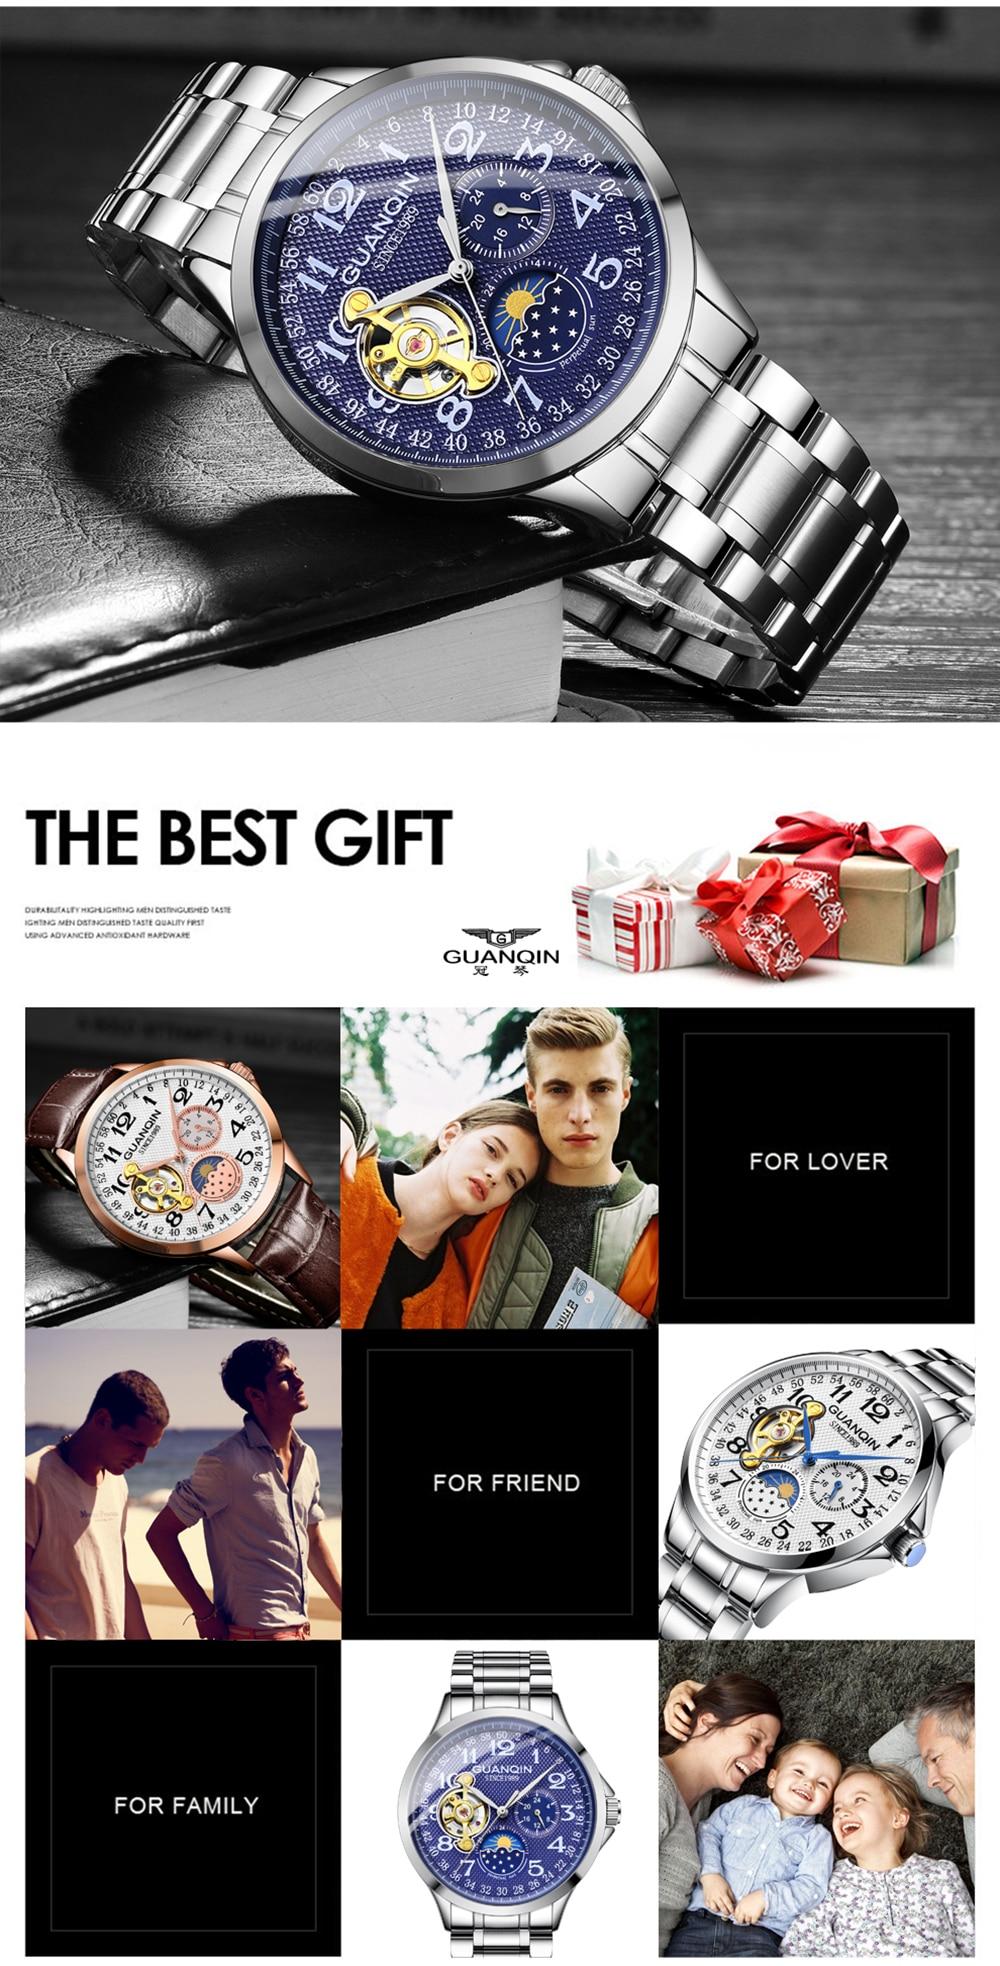 HTB1Cyz3XRWD3KVjSZKPq6yp7FXag GUANQIN mechanical watch men waterproof automatic skeleton tourbillon clock men business top brand luxury Relogio Masculino